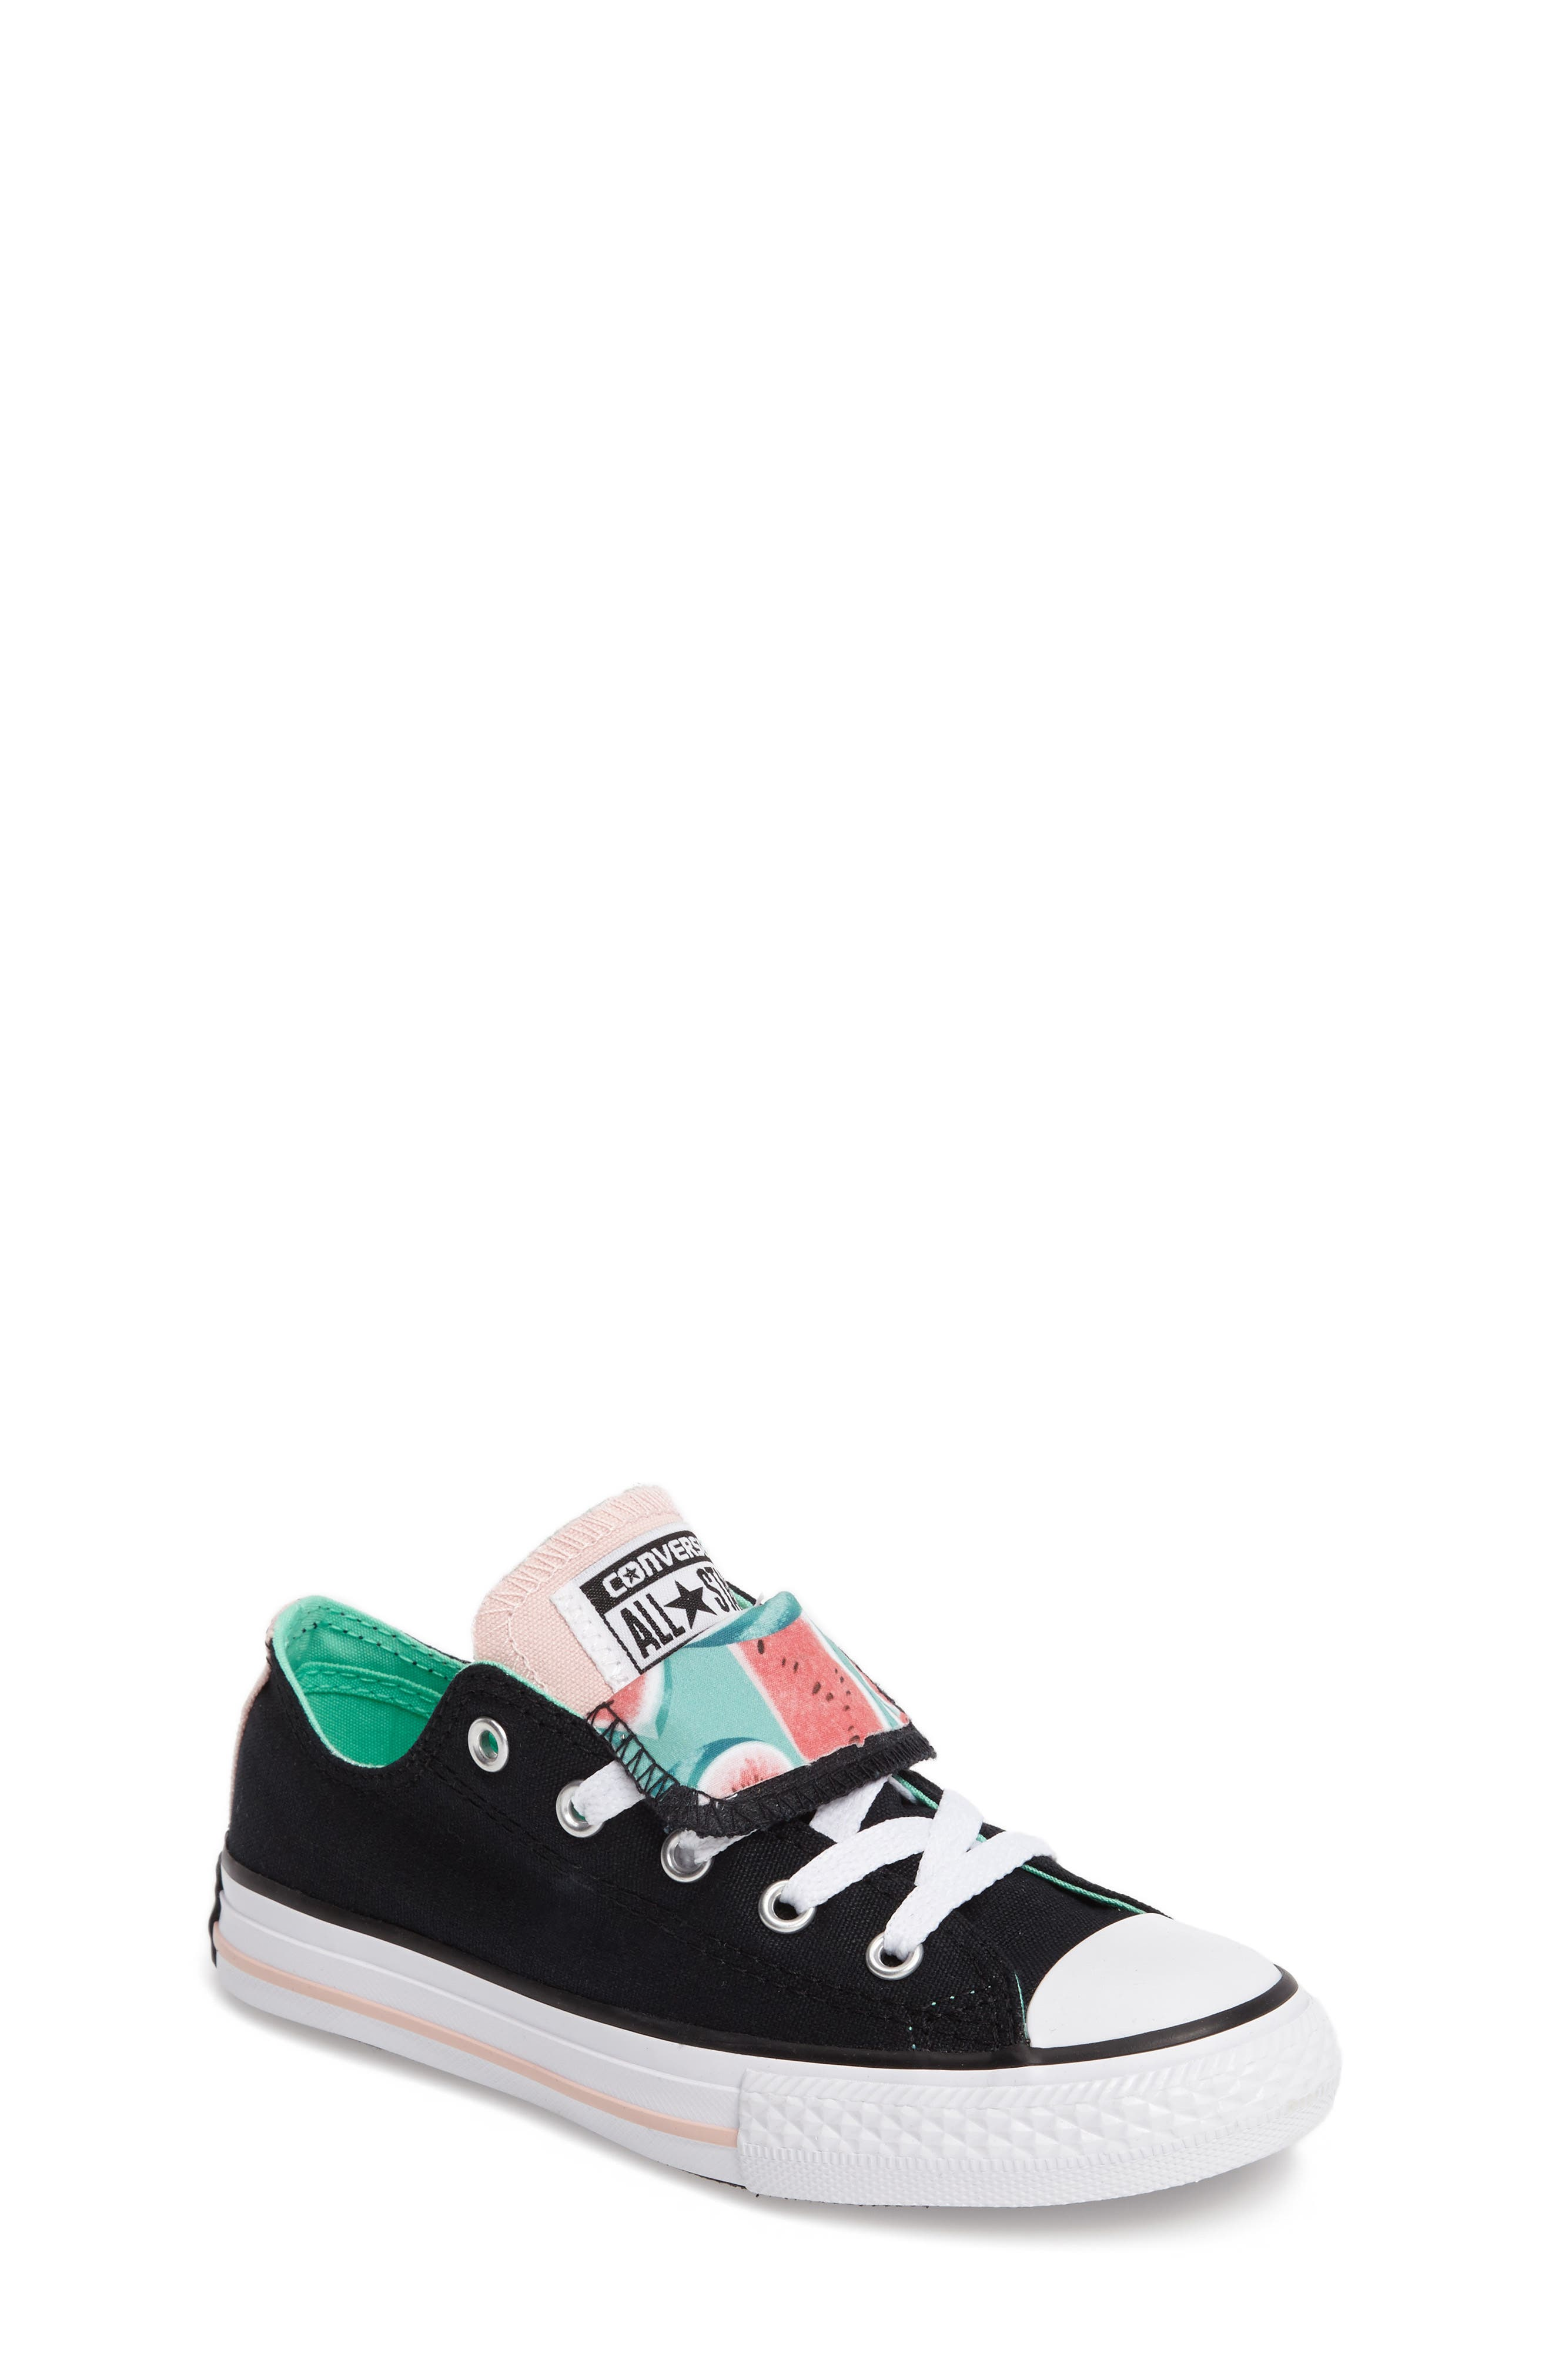 Converse Chuck Taylor® All Star® Watermelon Print Sneaker (Toddler & Little Kid)